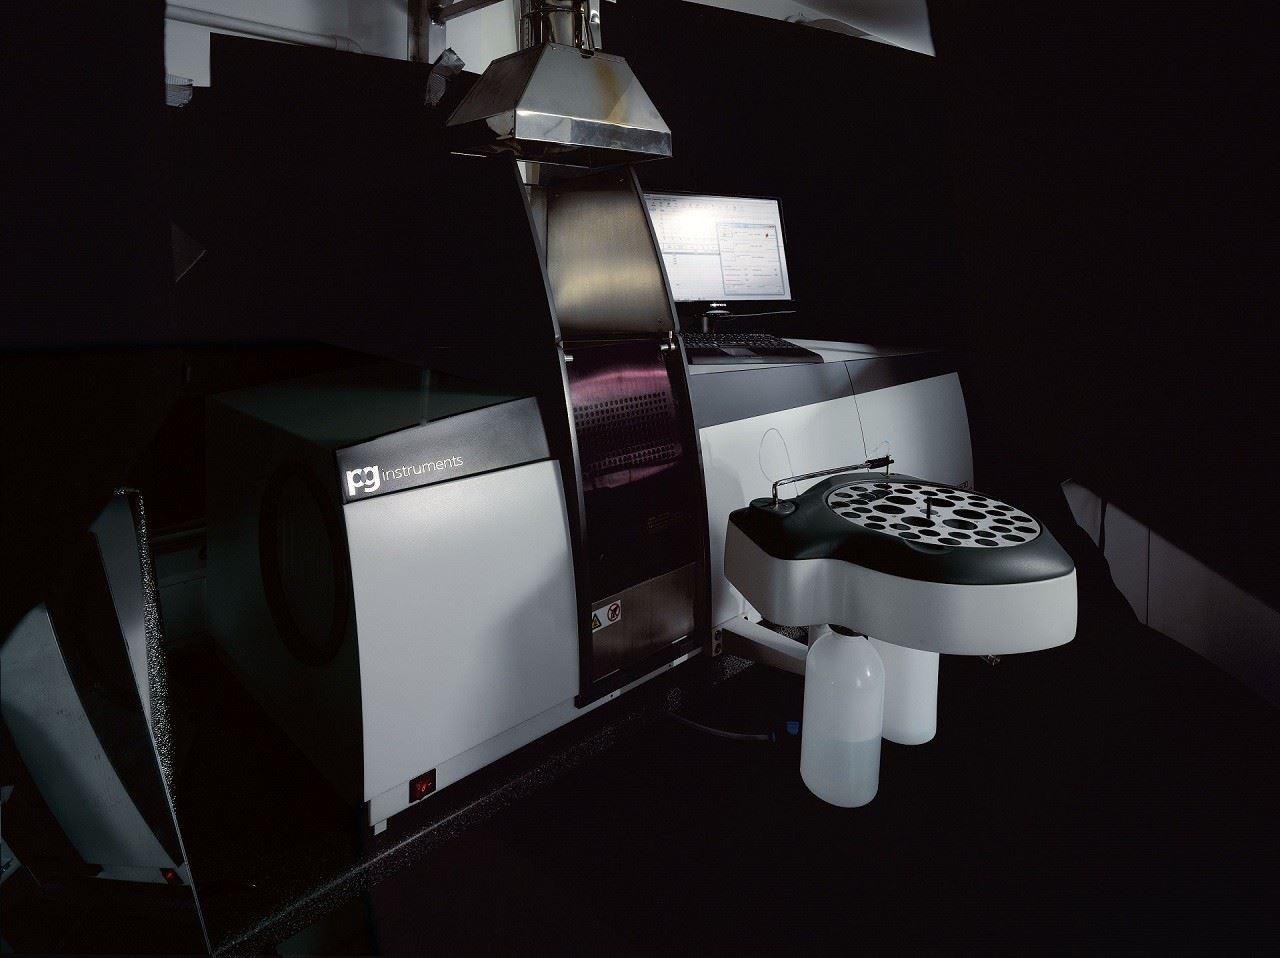 spektrometr asa